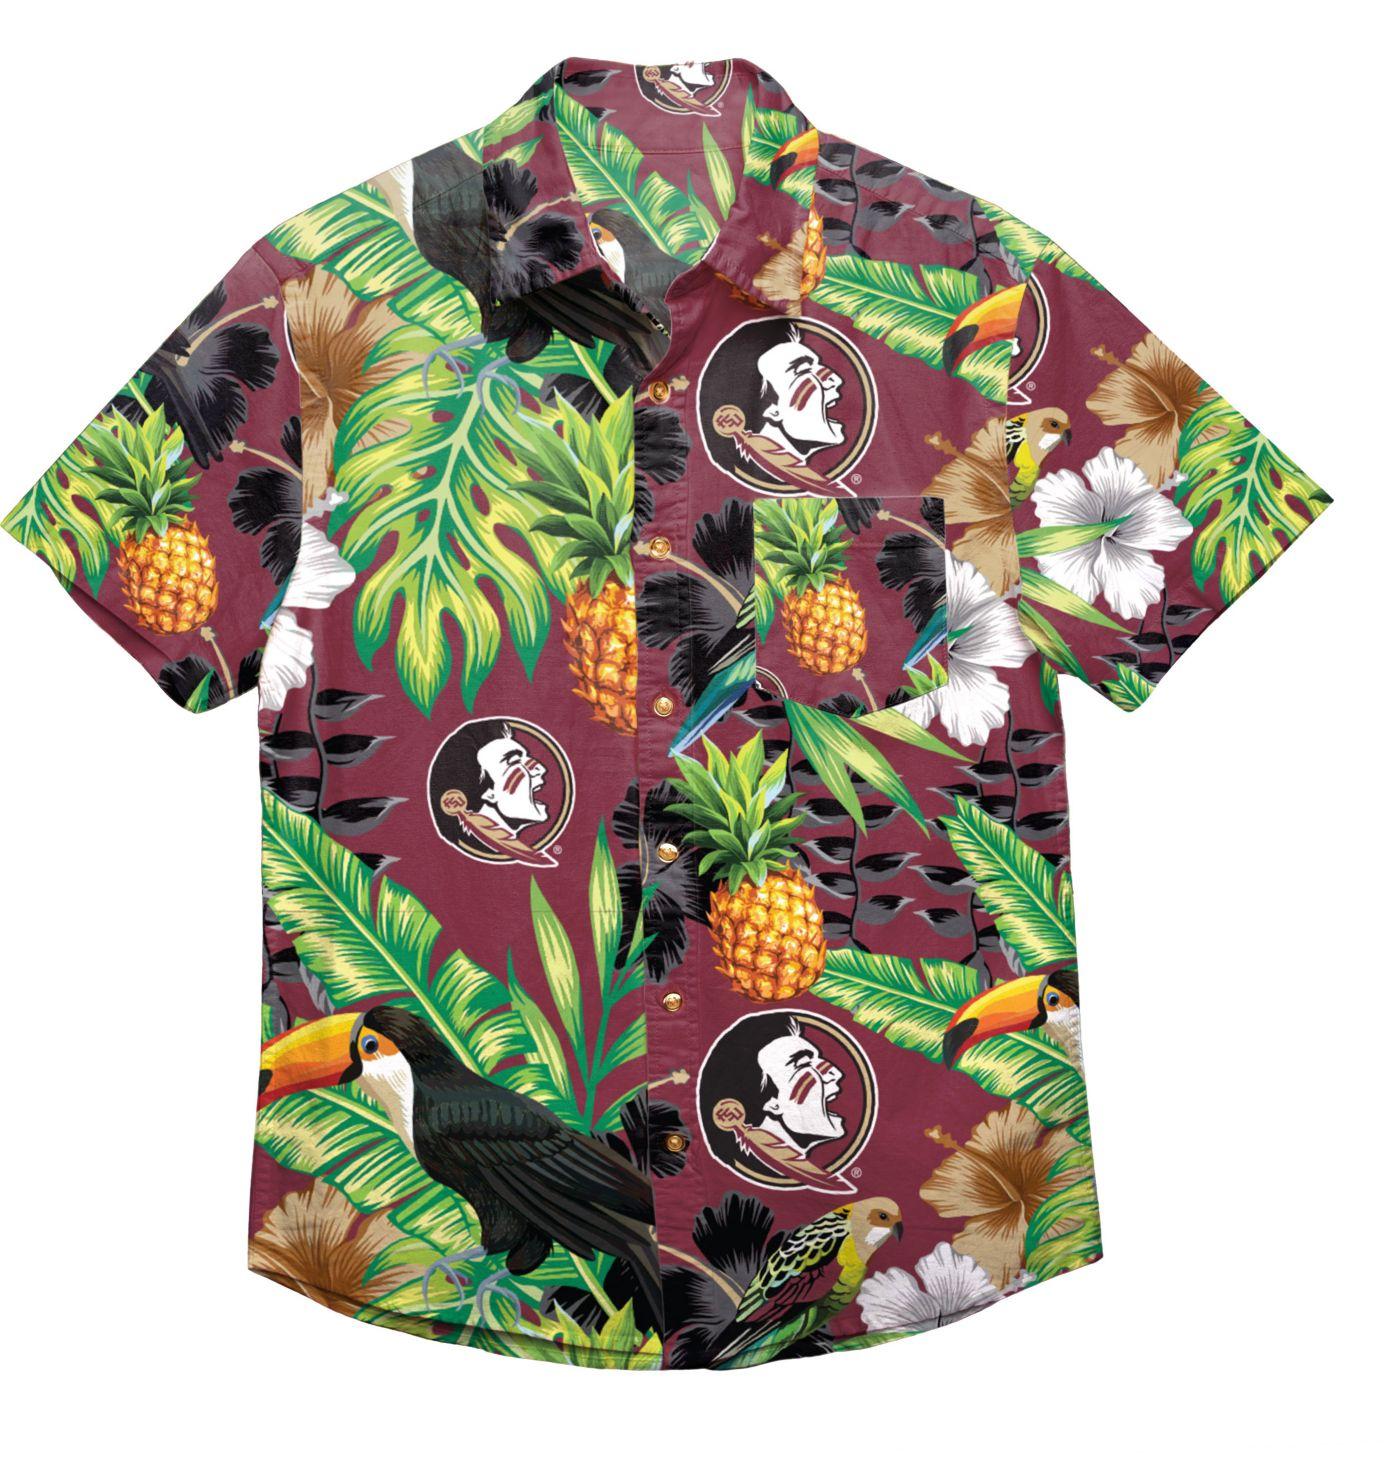 FOCO Men's Florida State Seminoles Garnet Floral Button-Up Shirt